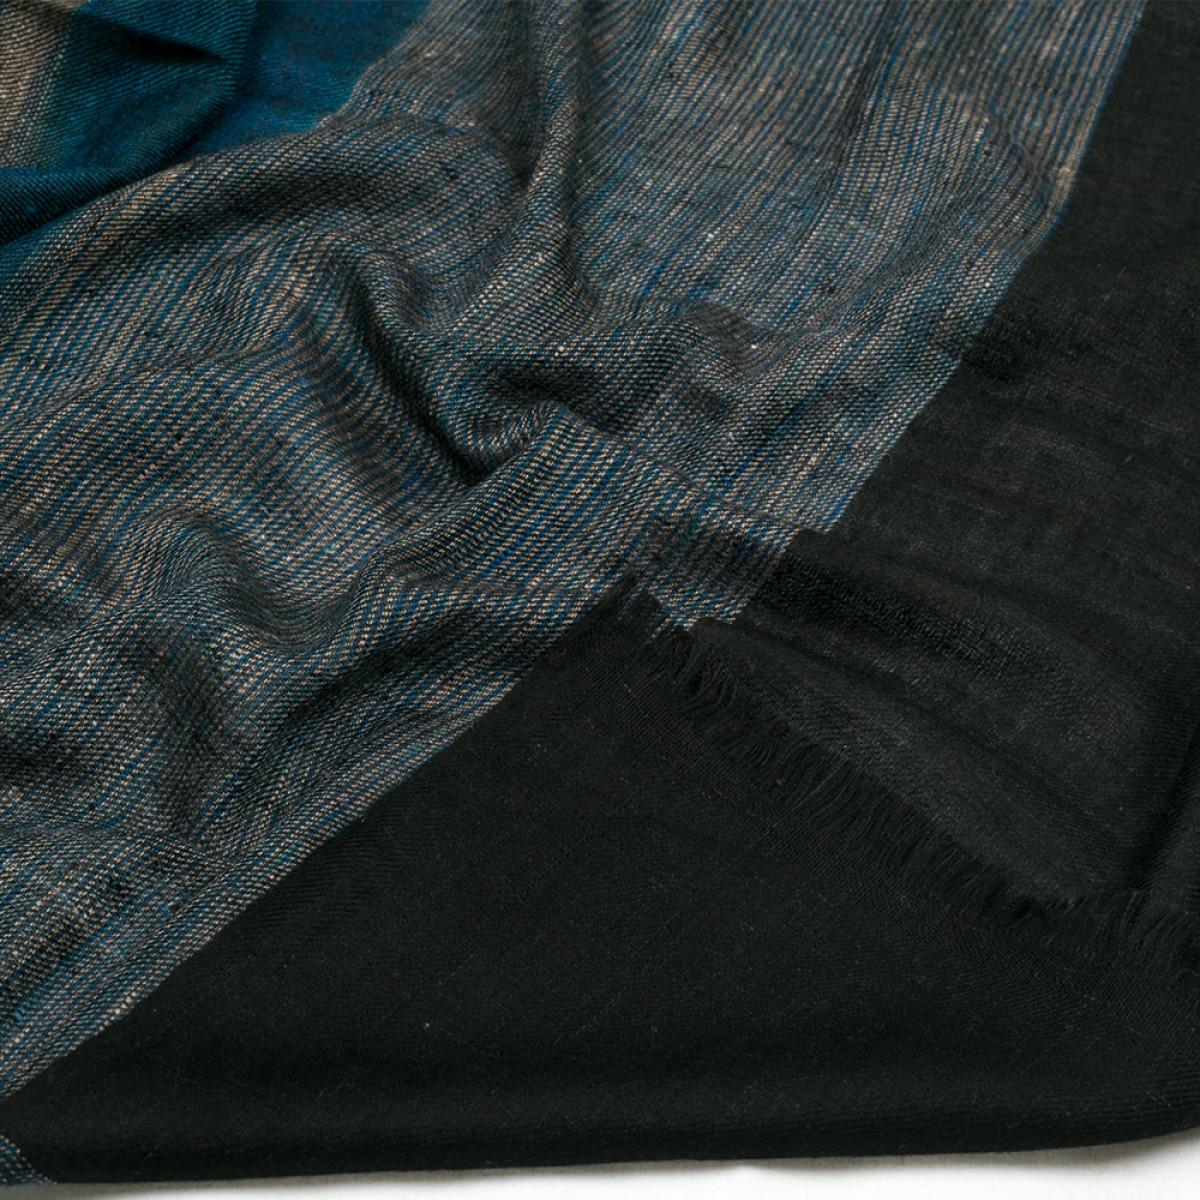 Ikat Cashmere Pashmina Stole - Dark Blue & Black